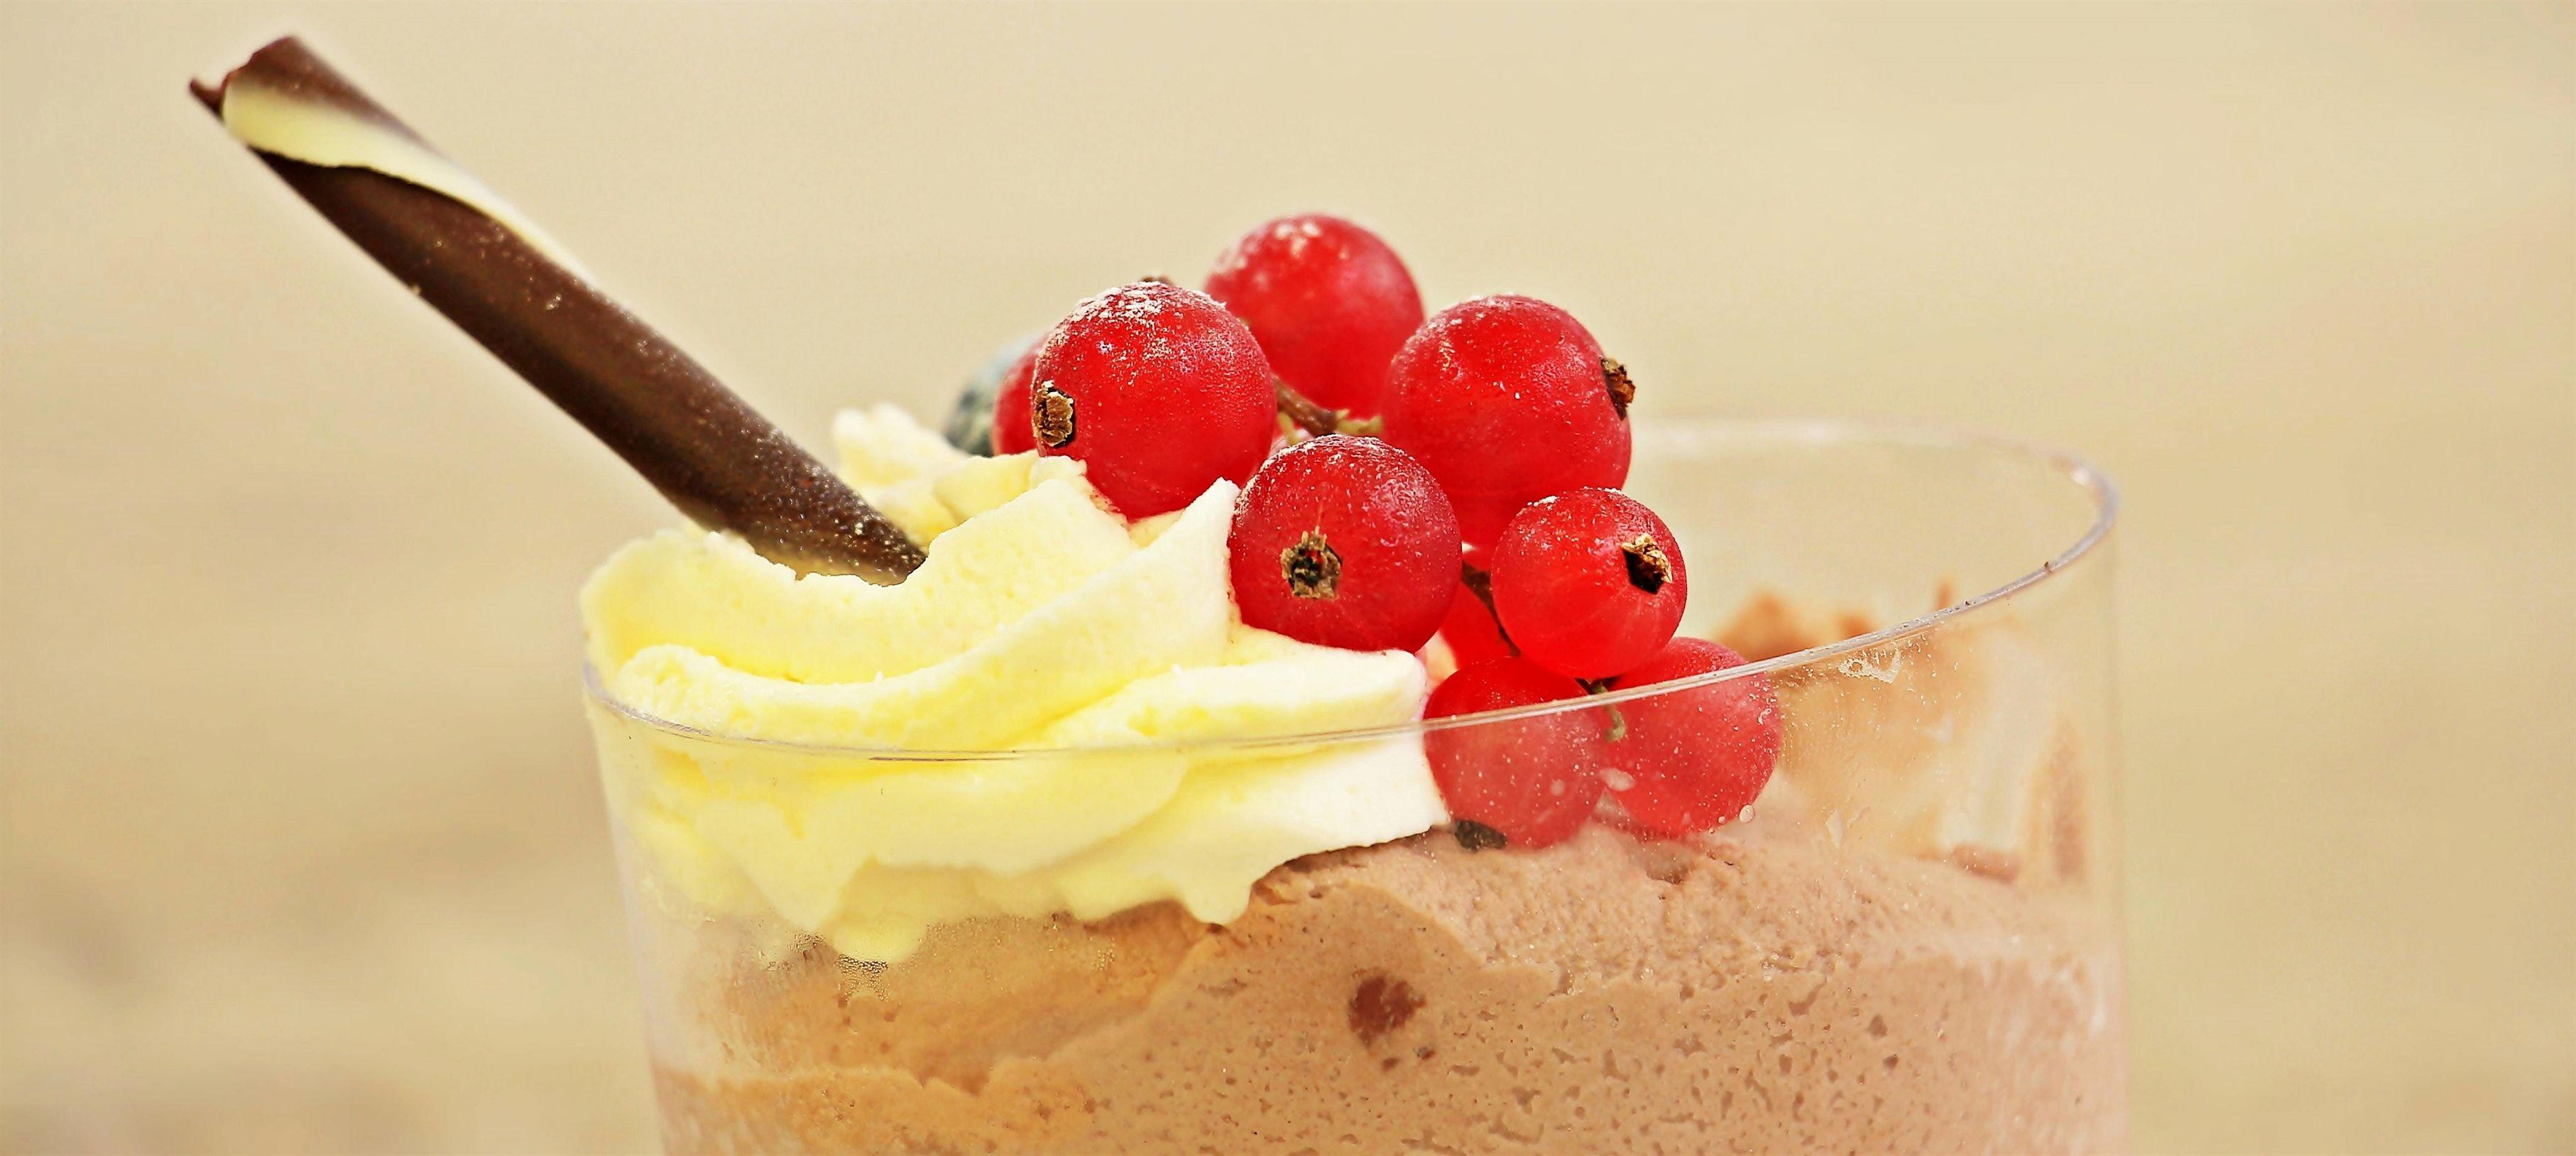 Five foods to enjoy to improve your skin food milk